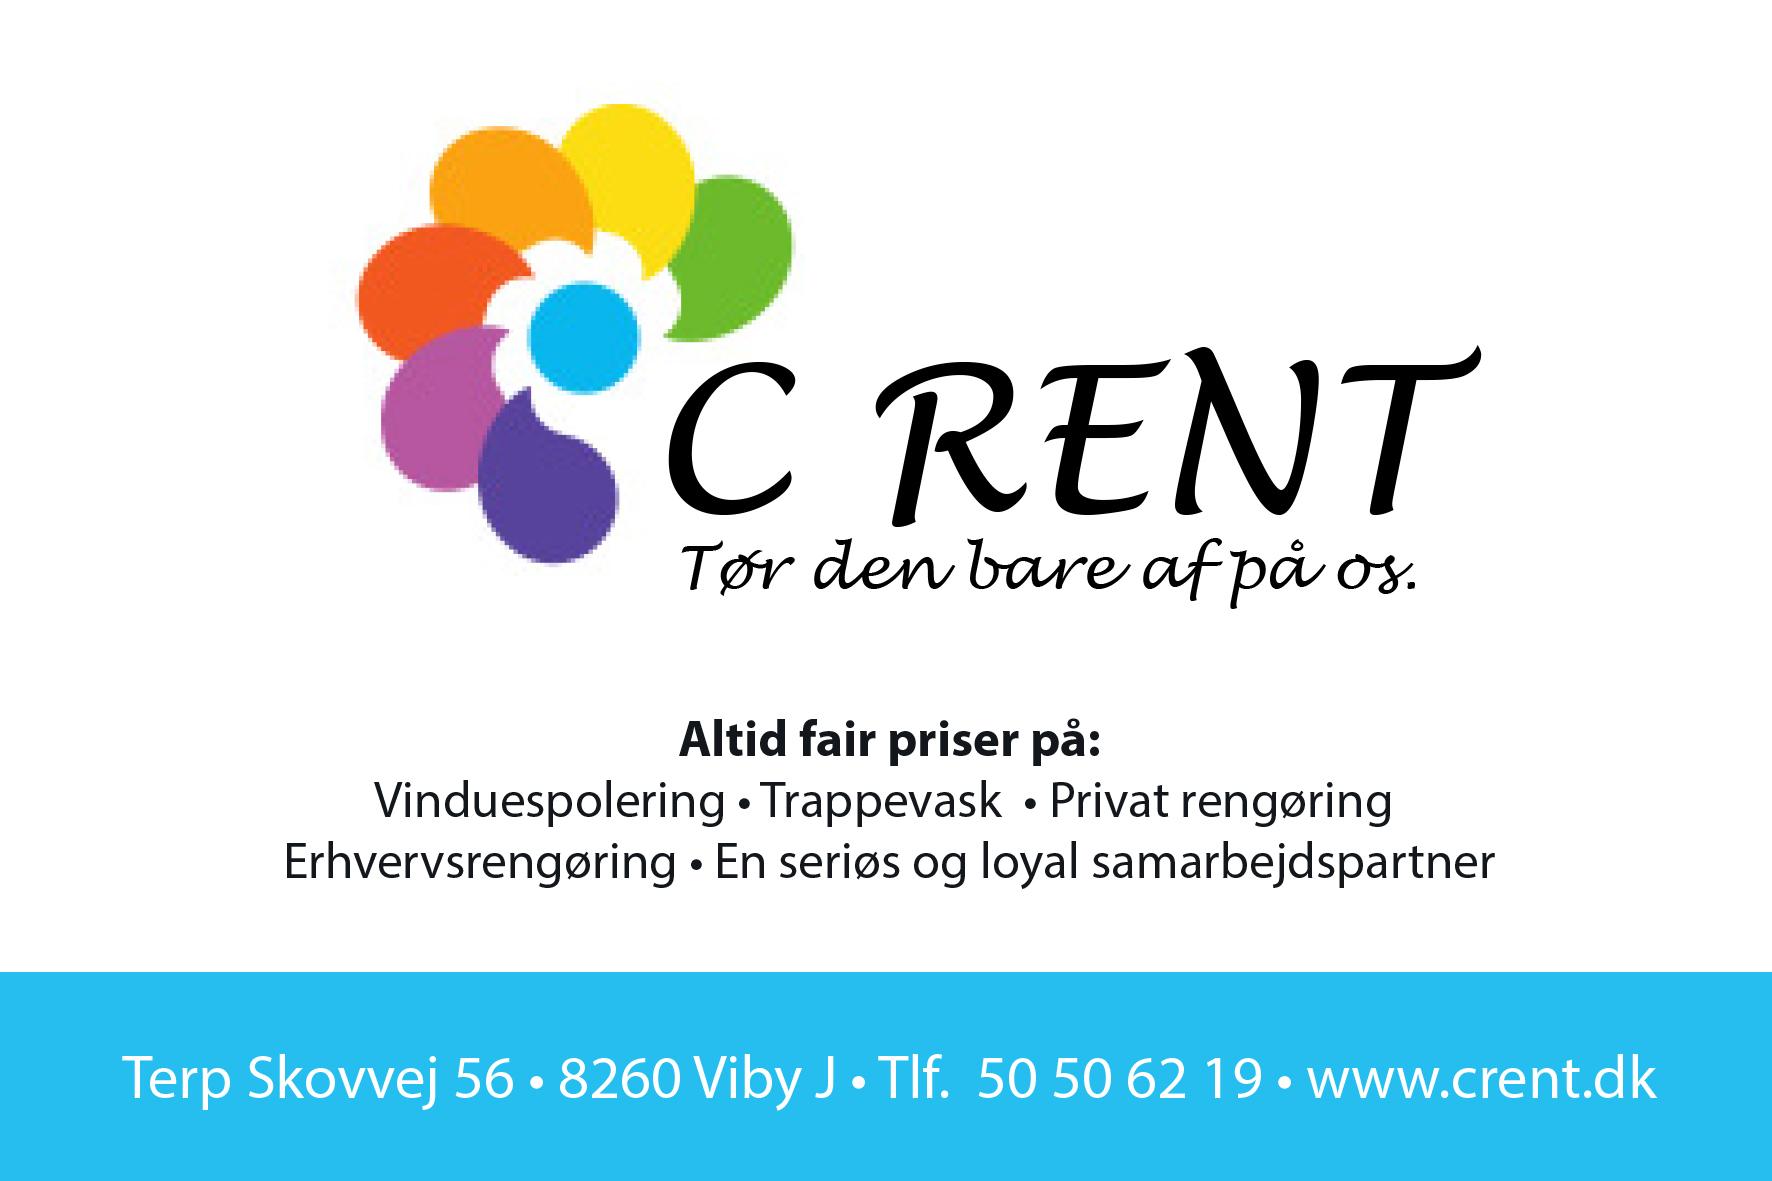 crent 15x10.jpg